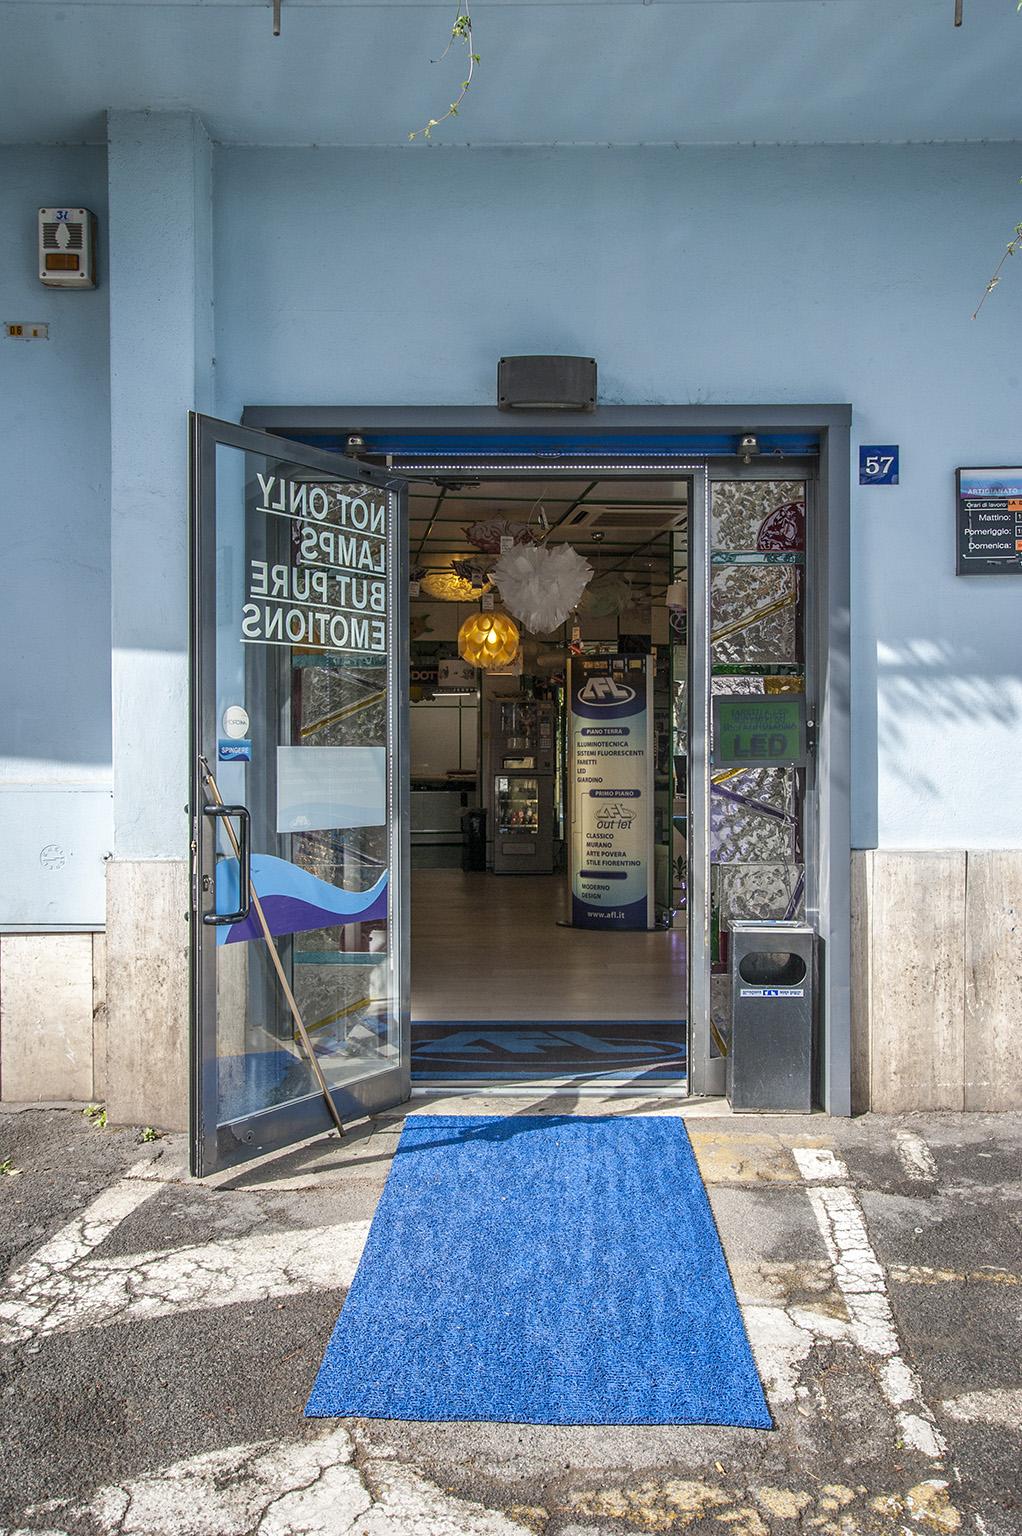 Artigianato Fiorentino Lampadari | My Business Virtual Tour